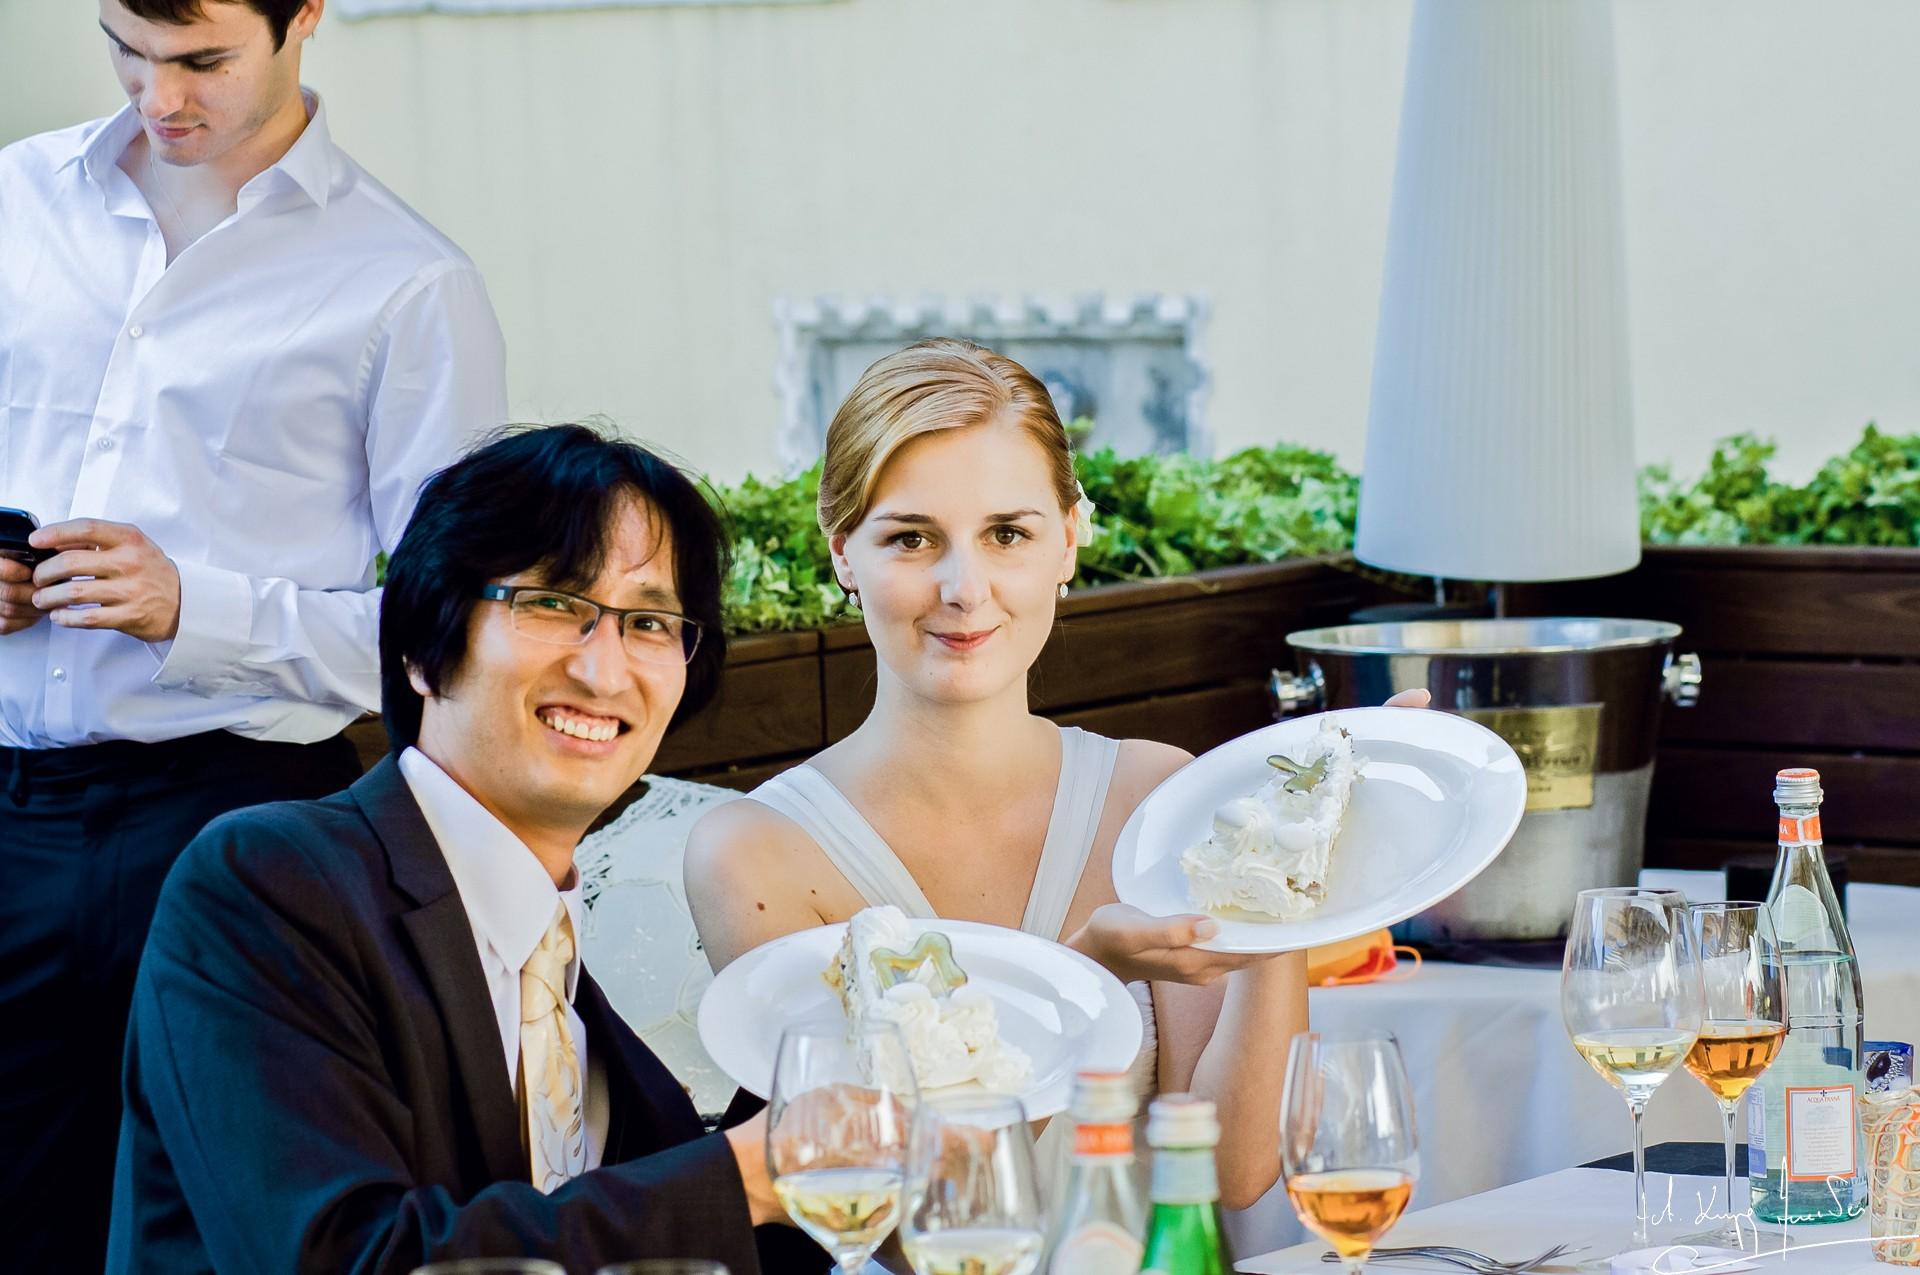 Ślub w wenecji 71 Manuela Luiza & Young Seon Song